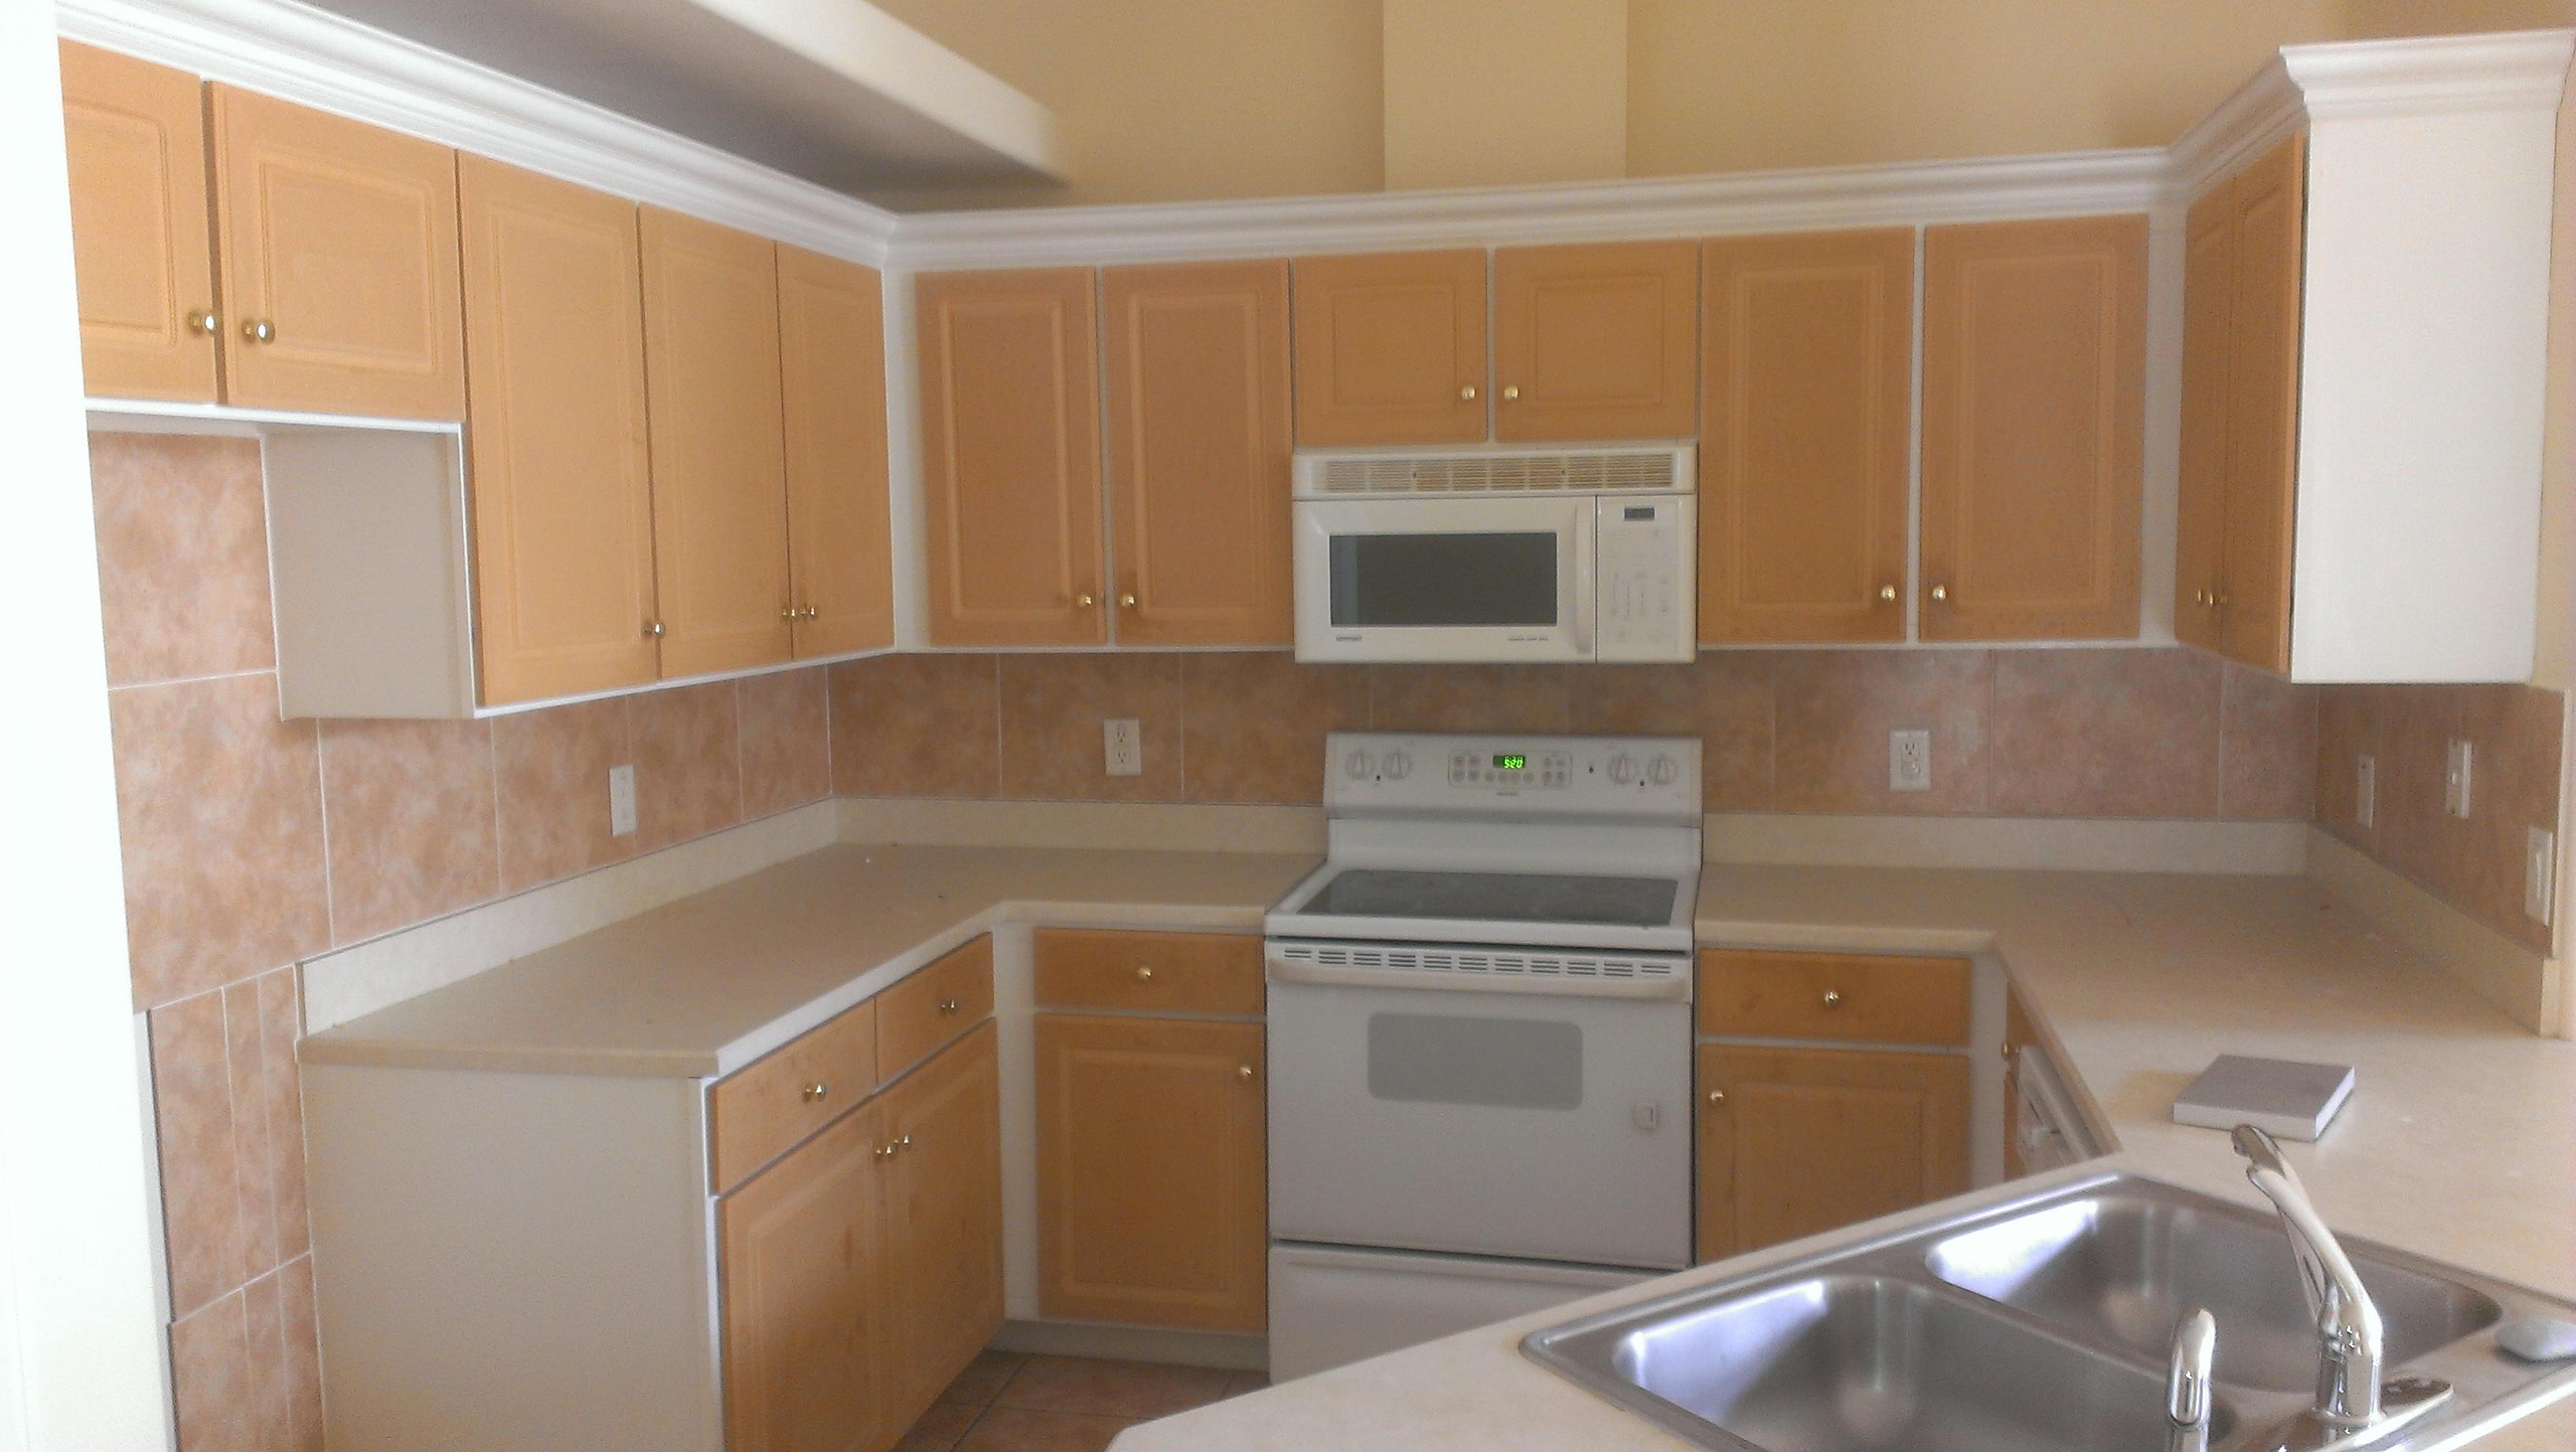 daytona beach cabinet refinishing refinish kitchen sink Cabinet Refinishing Professionals